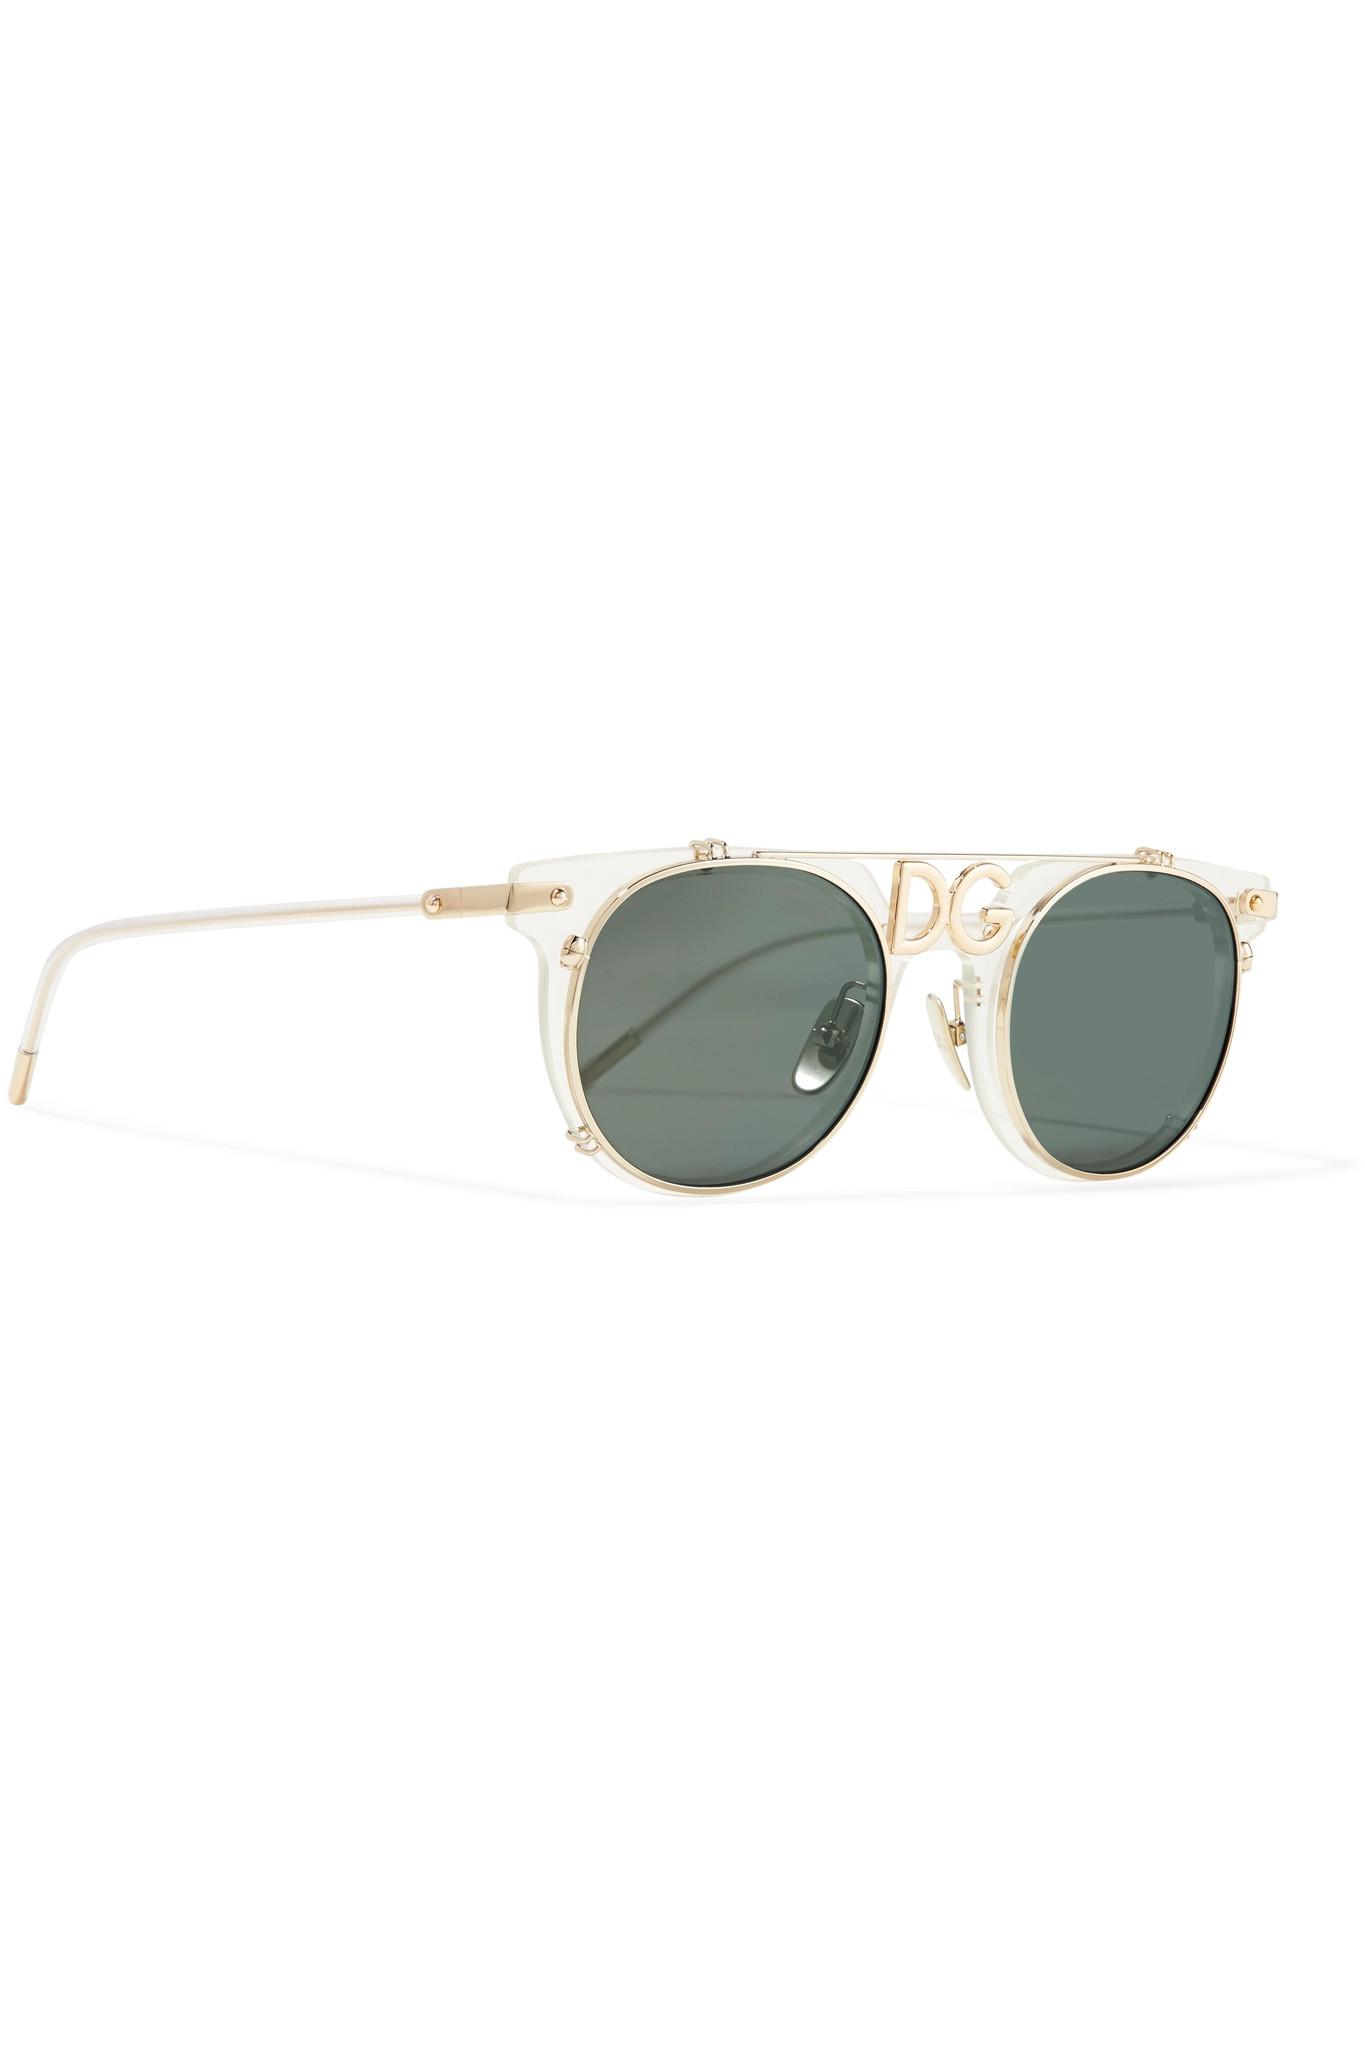 35d2c6f6a003 Dolce   Gabbana - Metallic D-frame Acetate And Gold-tone Sunglasses - Lyst.  View fullscreen